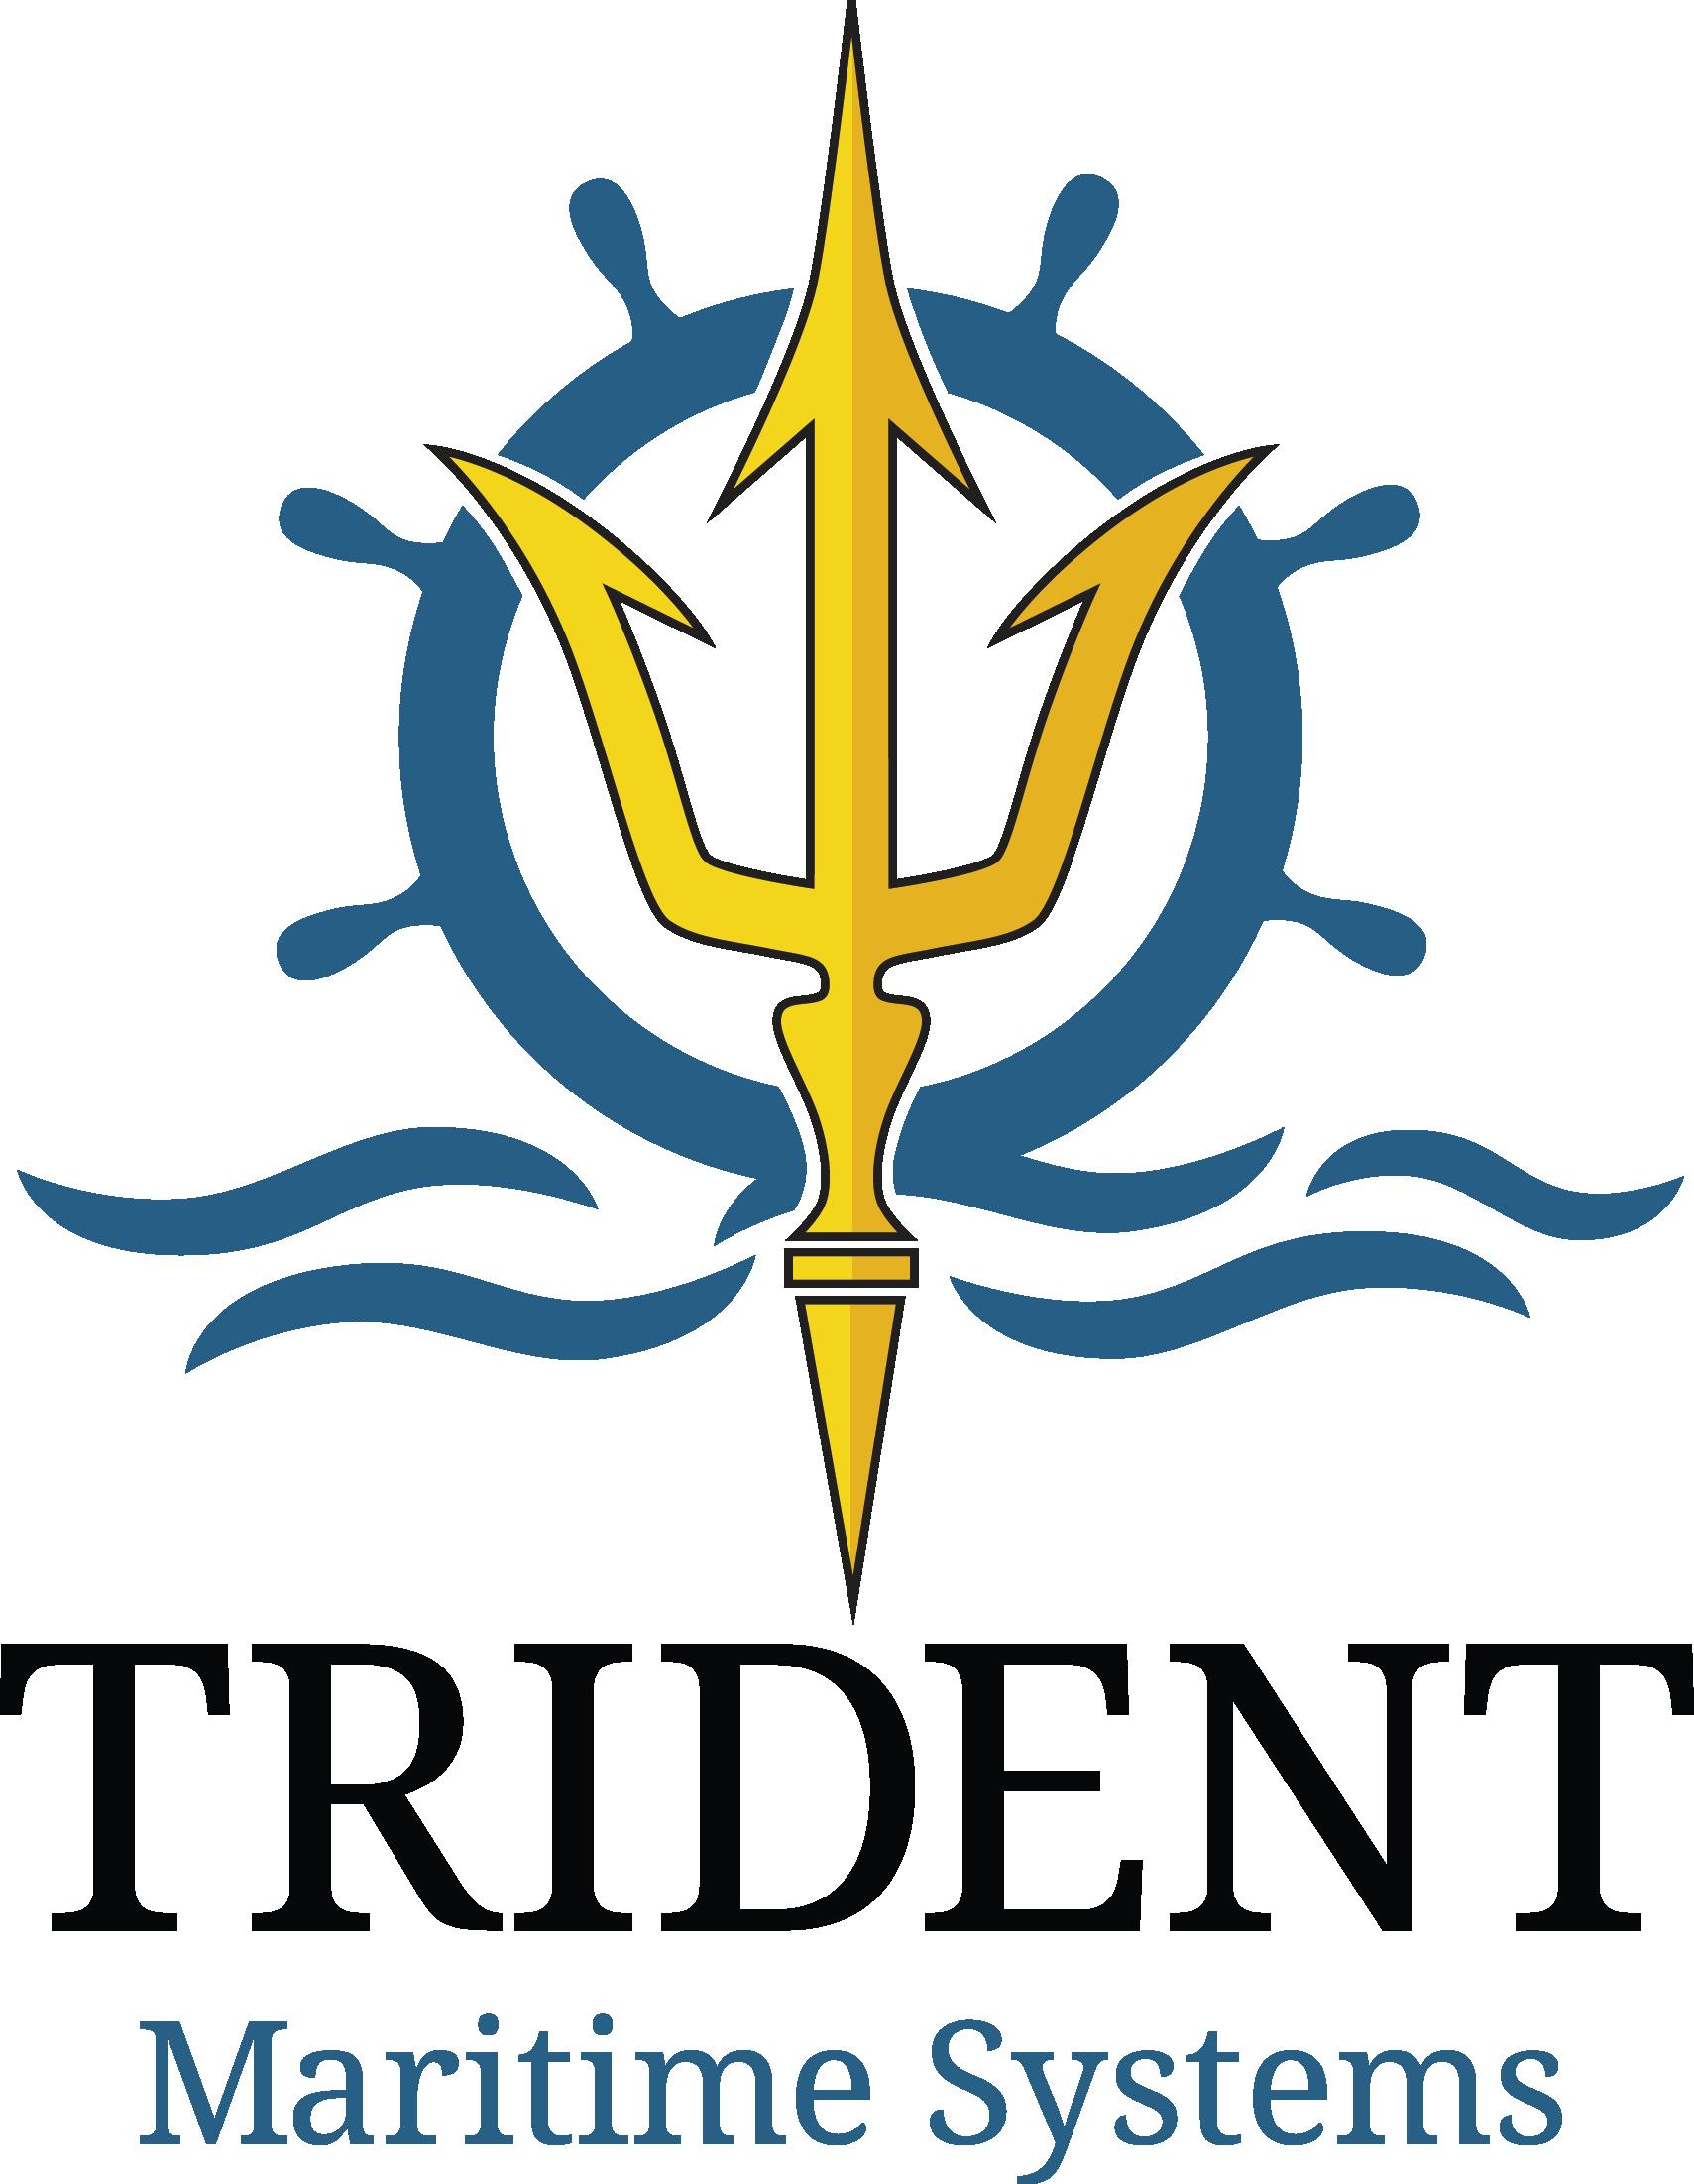 USJ-IMECO Renamed Trident Maritime Systems, November 3 2014